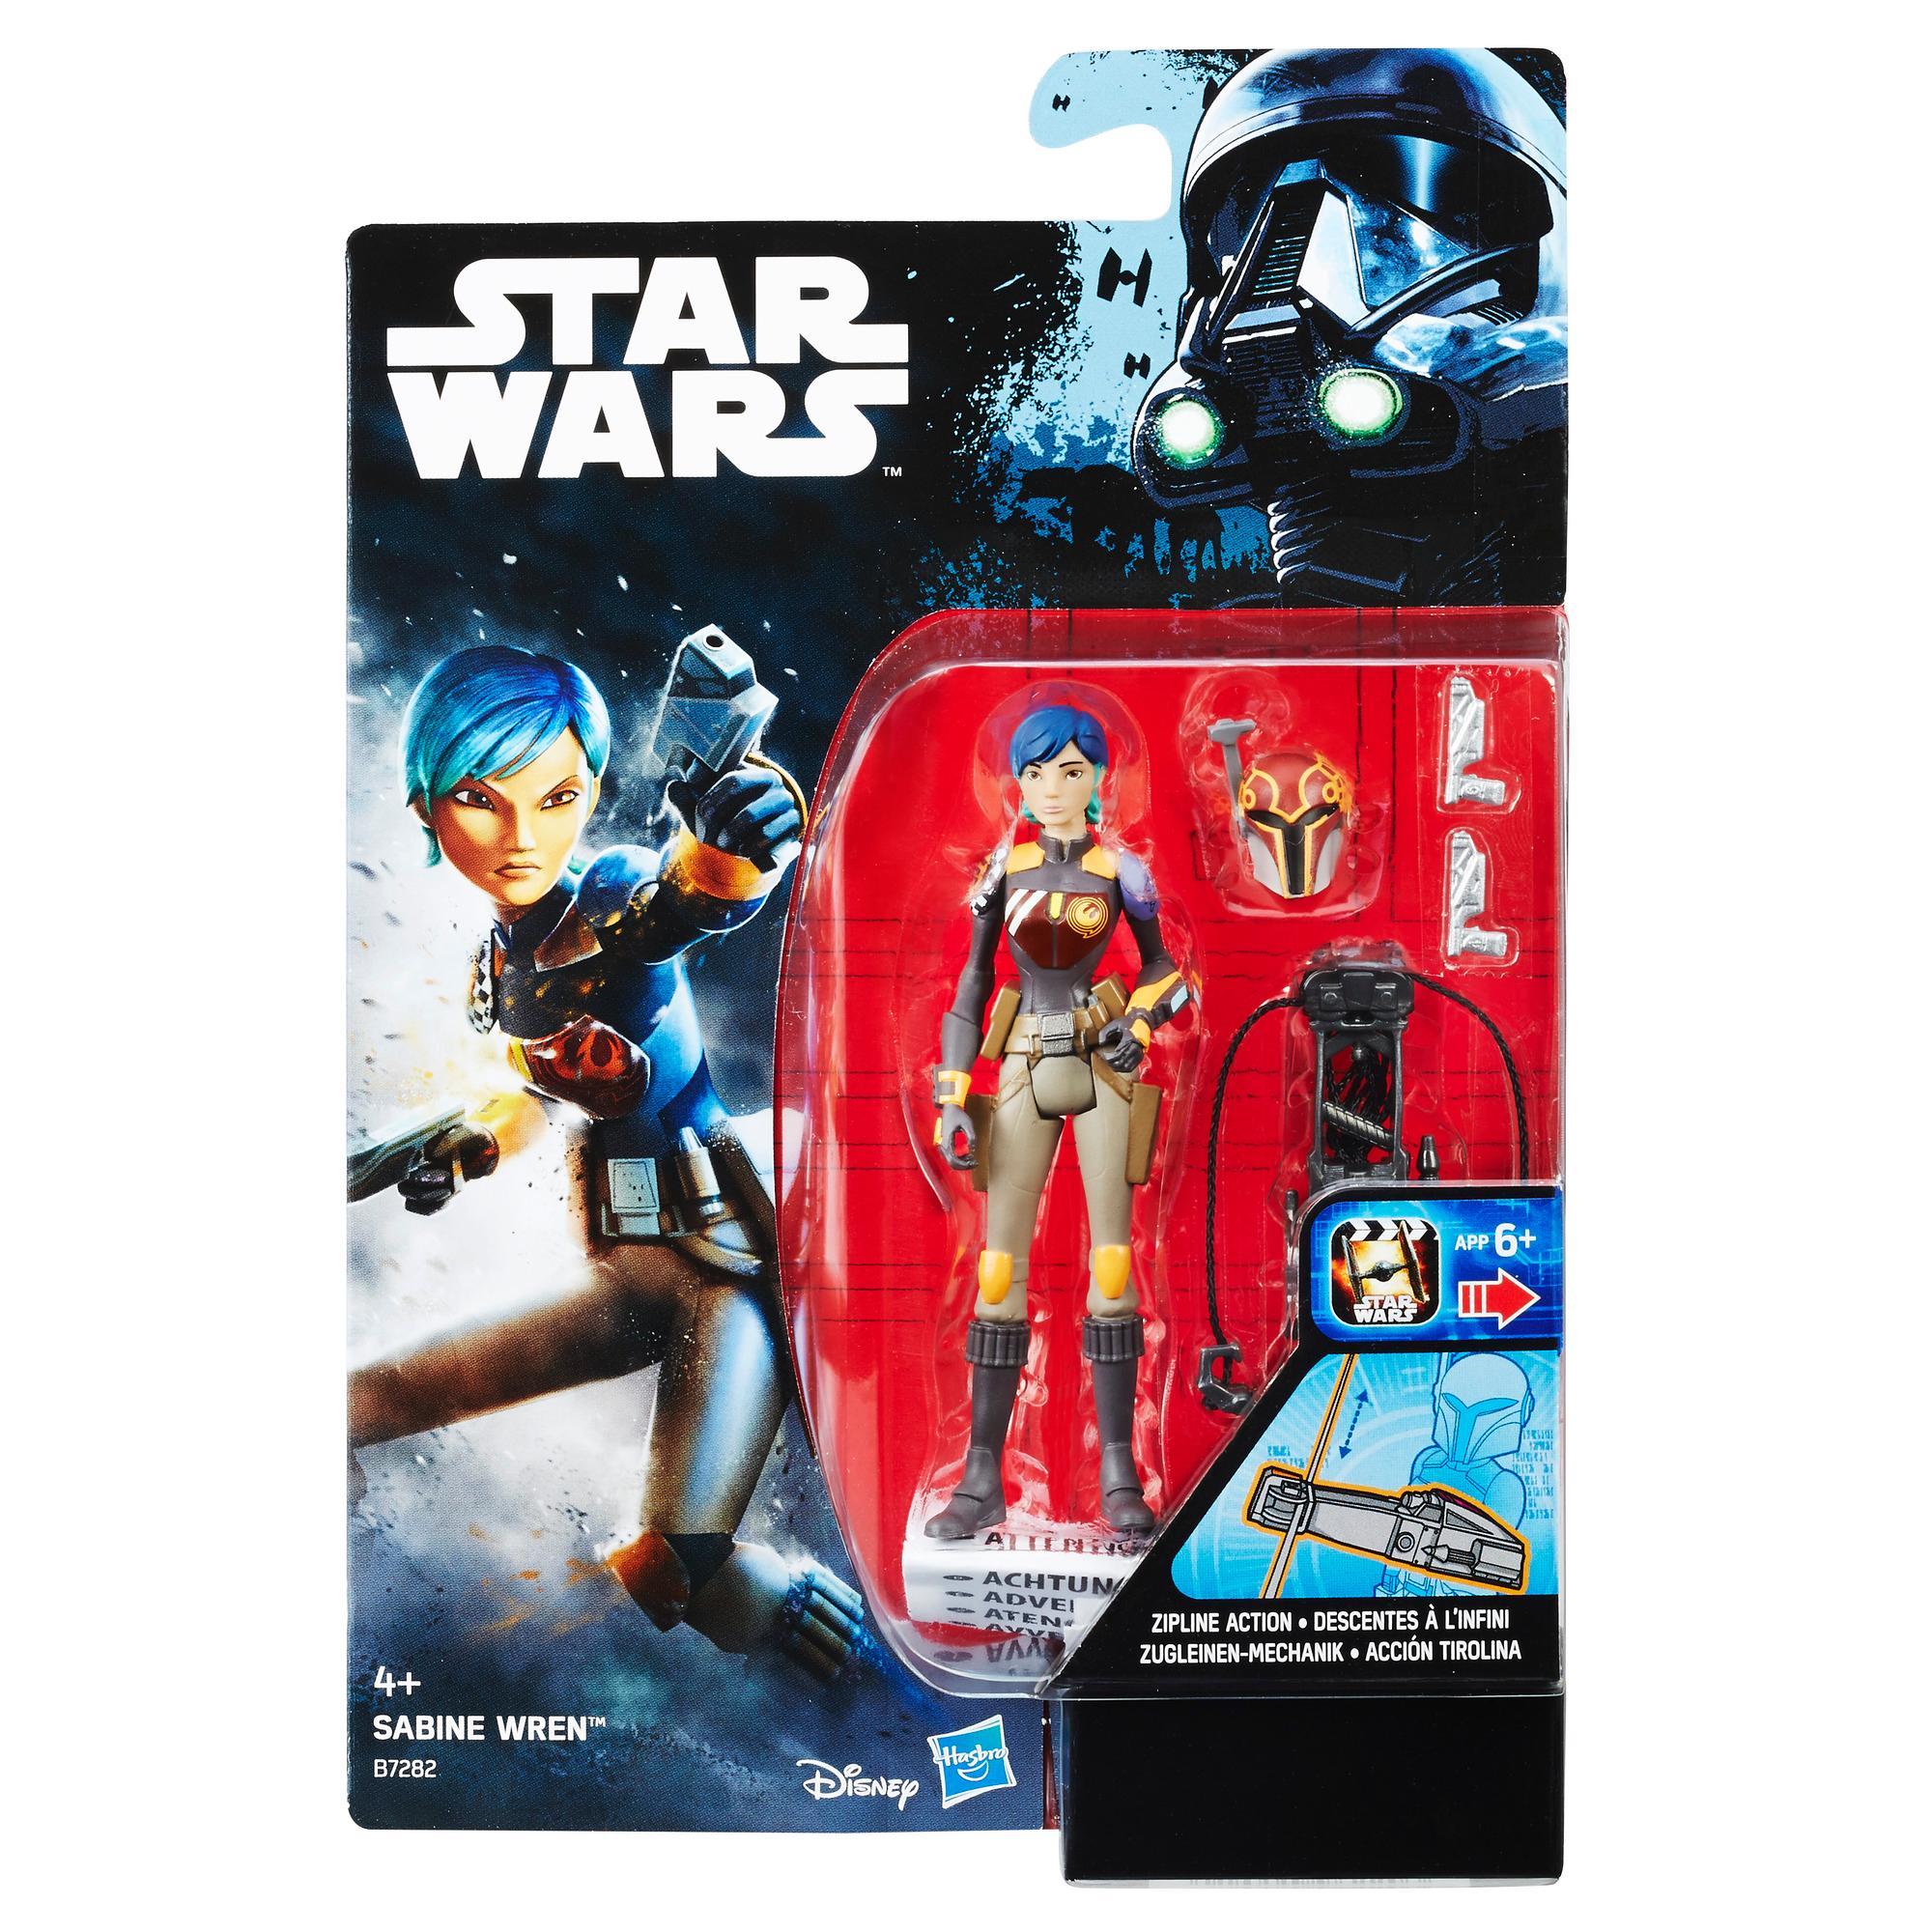 Star Wars Rebels Sabine Wren Figure